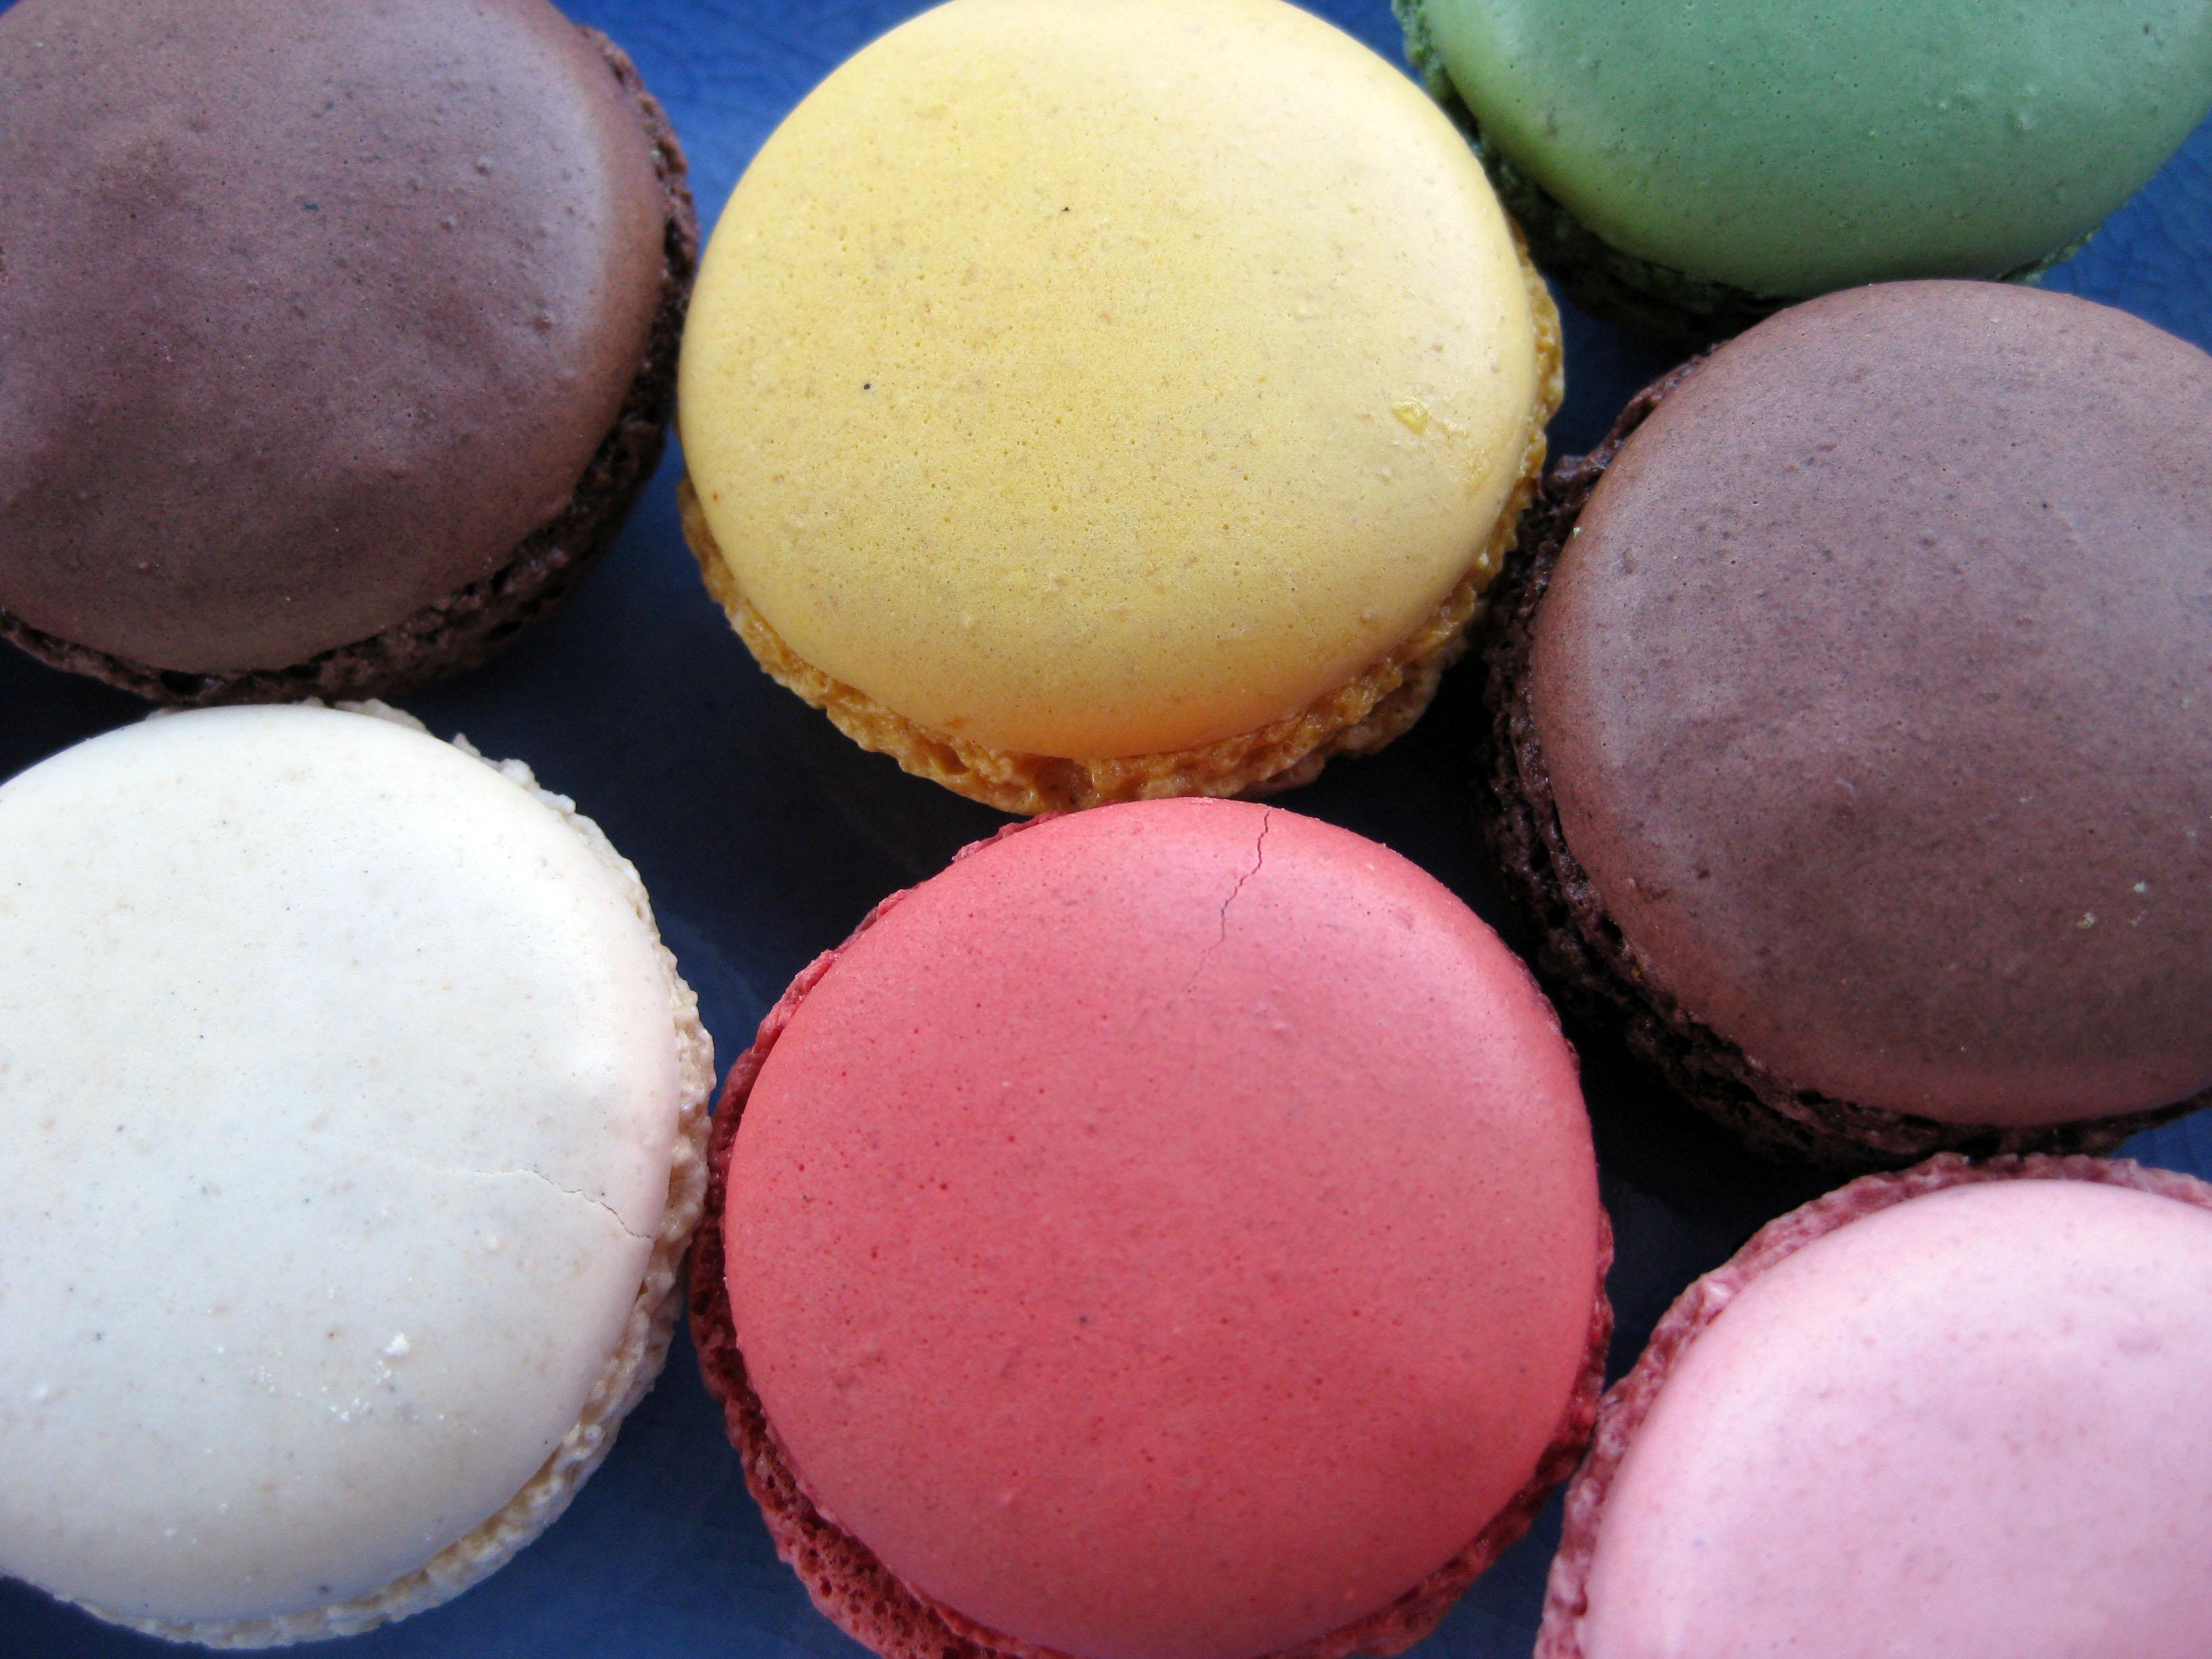 File:Closeup of macarons, August 2009.jpg - Wikimedia Commons